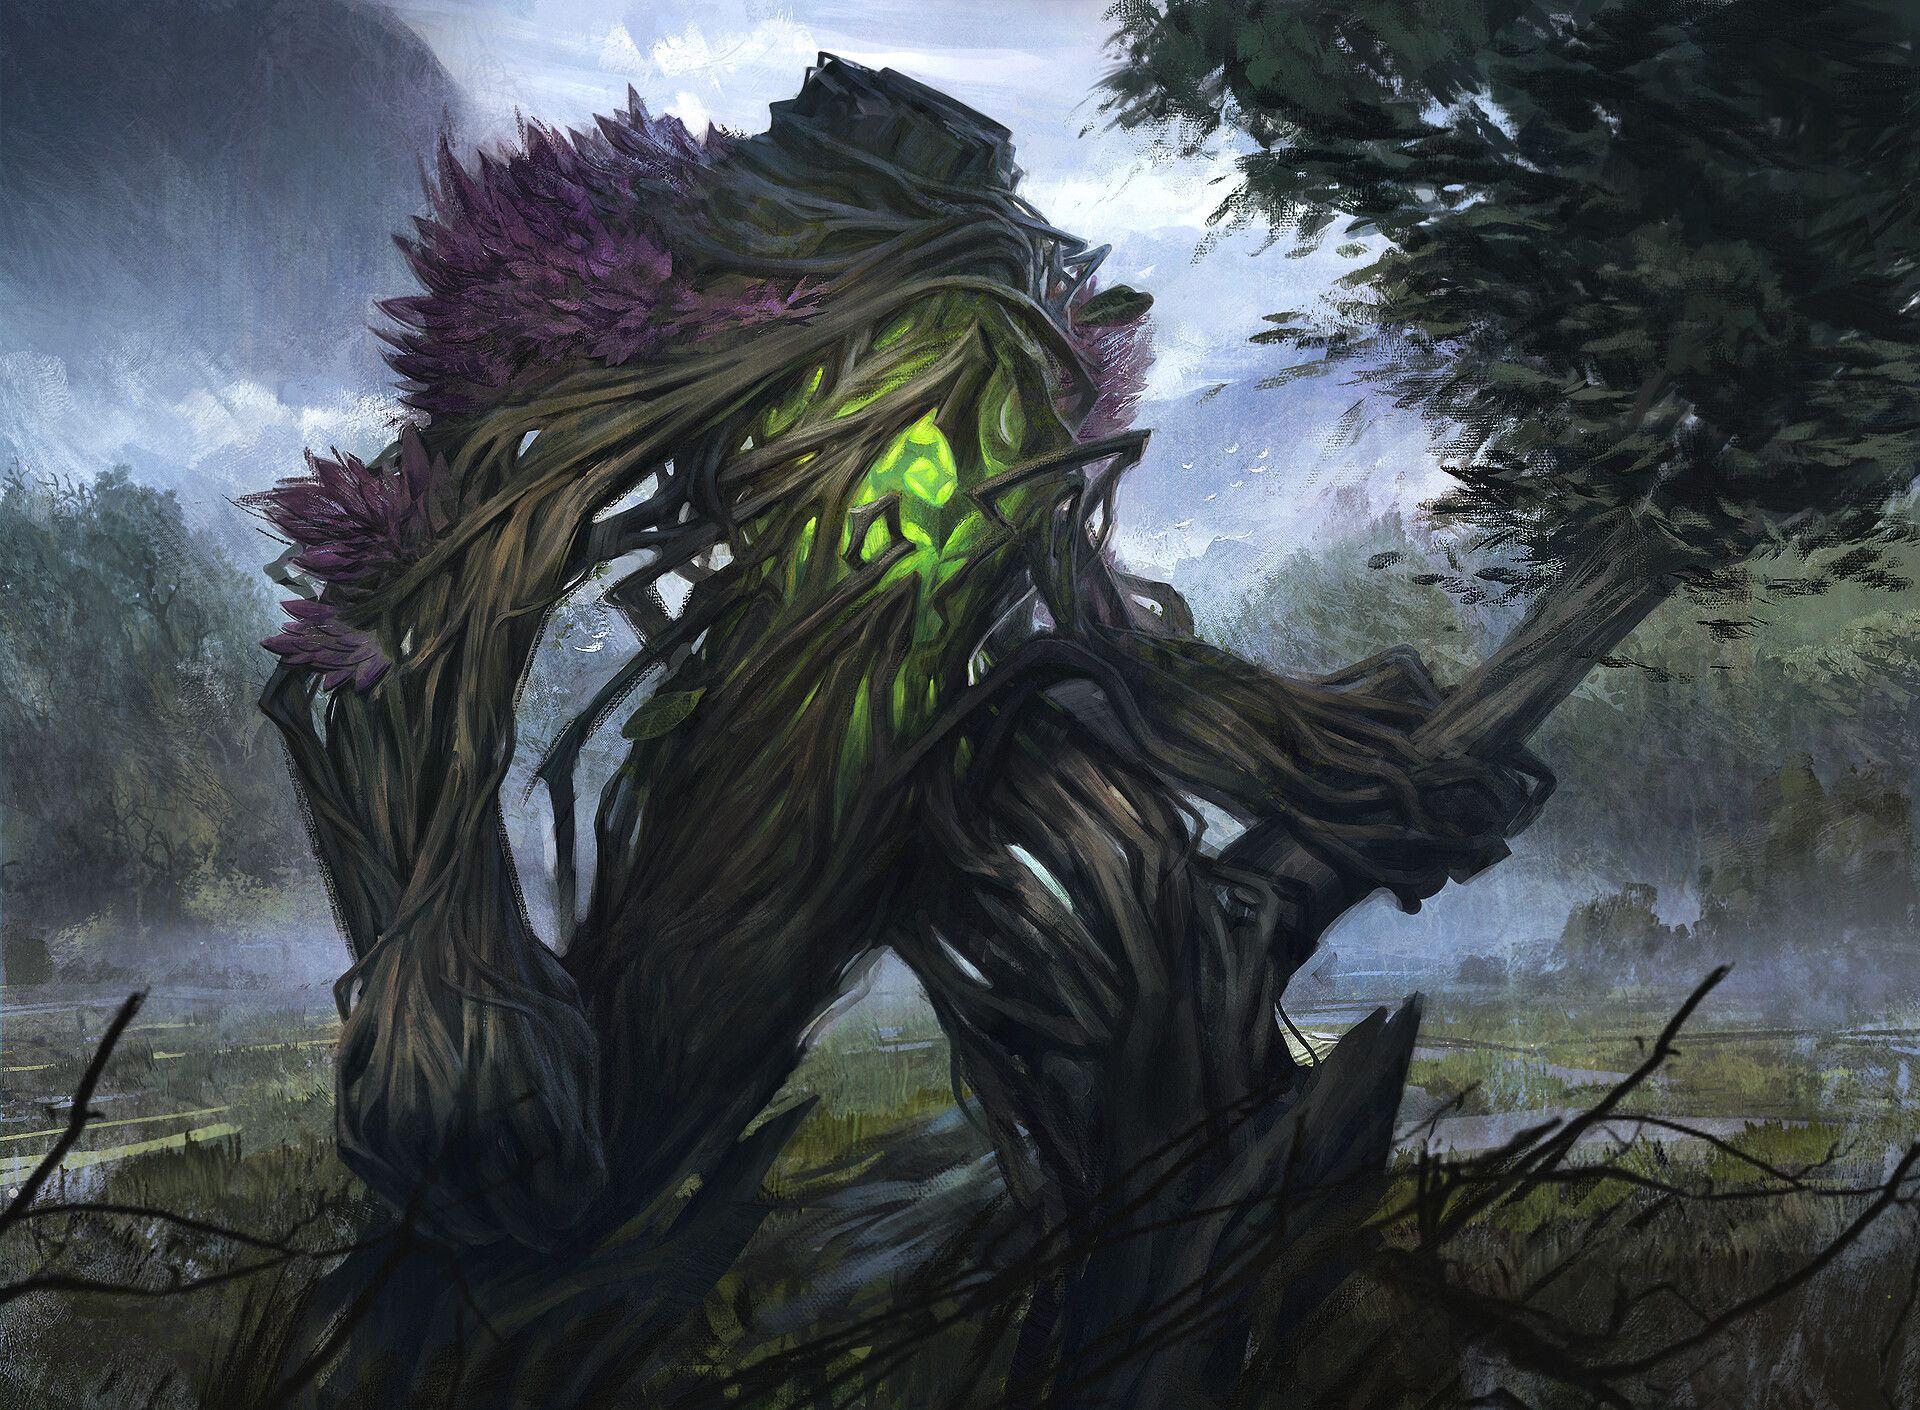 Artstation Golem Of The Forests Alisher Mirzoev Fantasy Monster Creature Concept Art Monster Concept Art